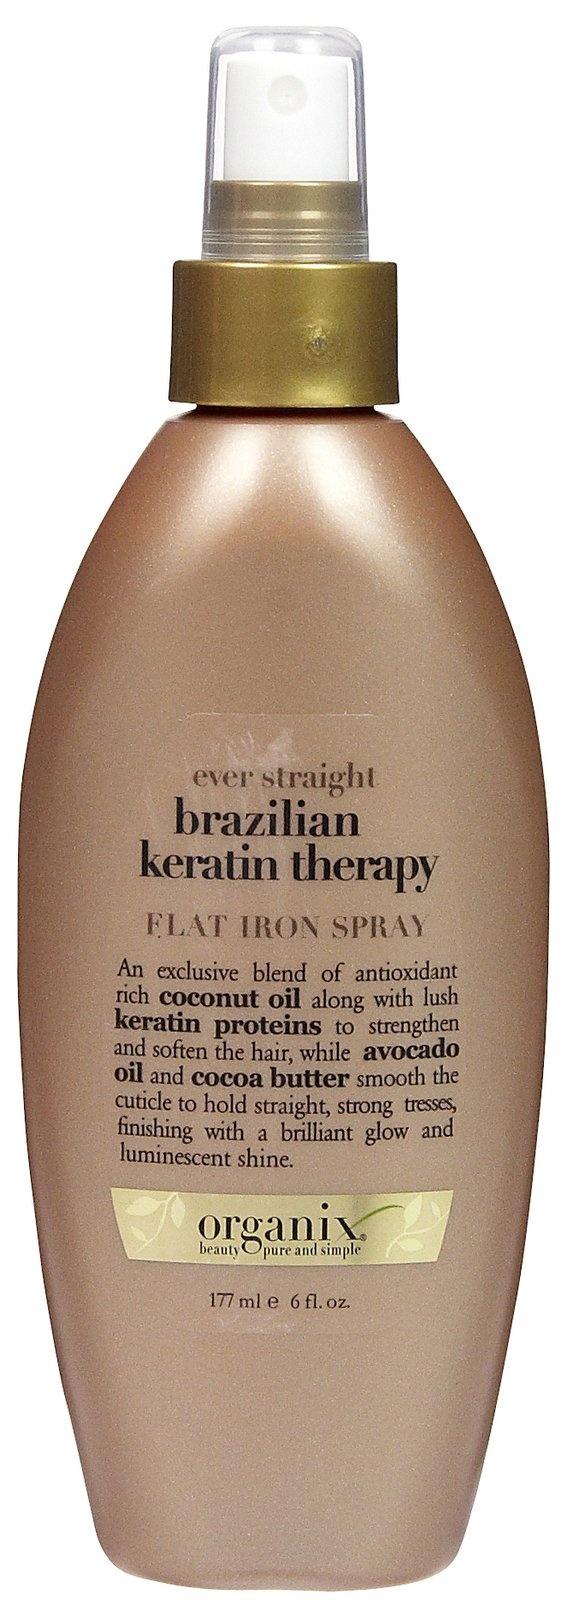 Organix Brazilian Keratin Therapy Ever Straight Flat Iron Spray - love it!